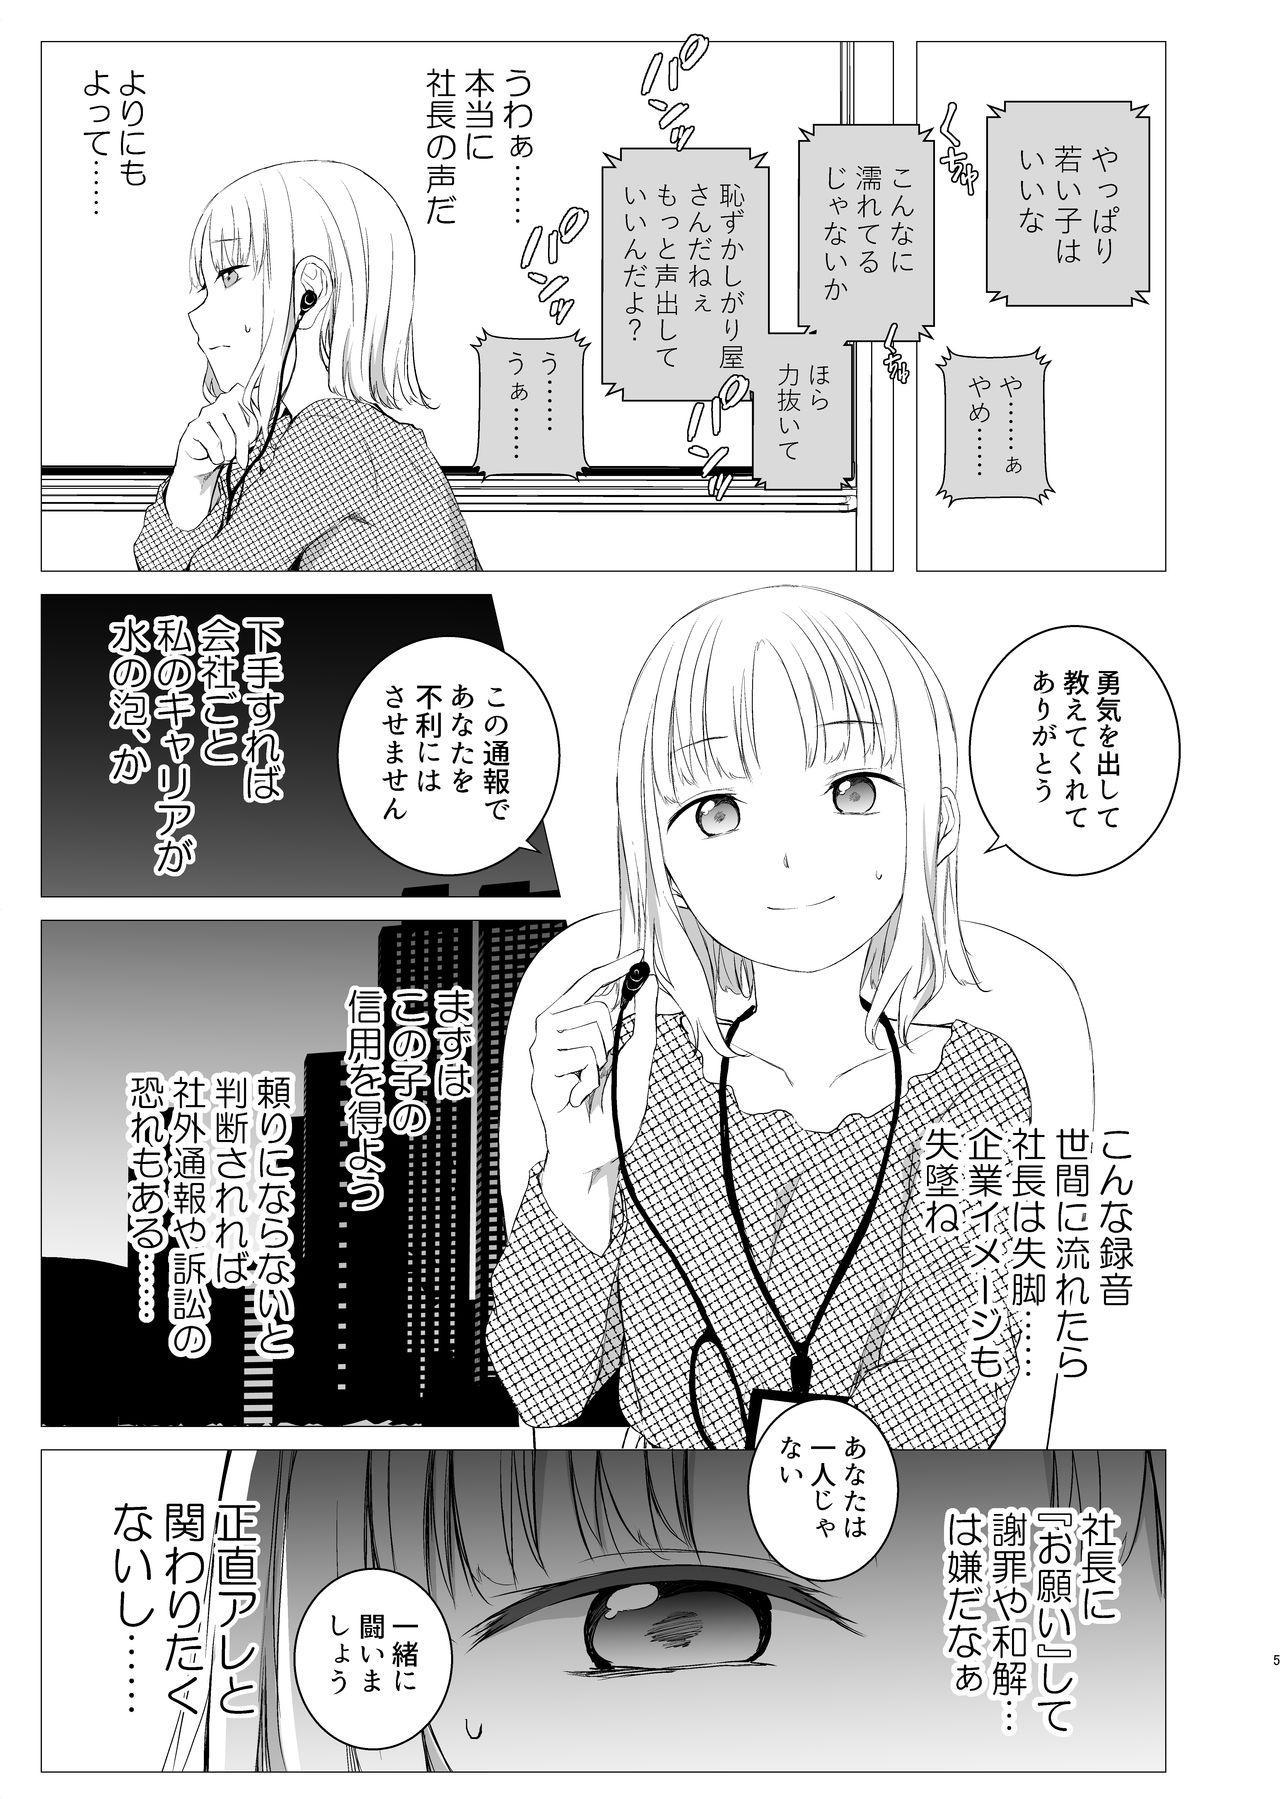 Hanayomi no Makurakotoba 3